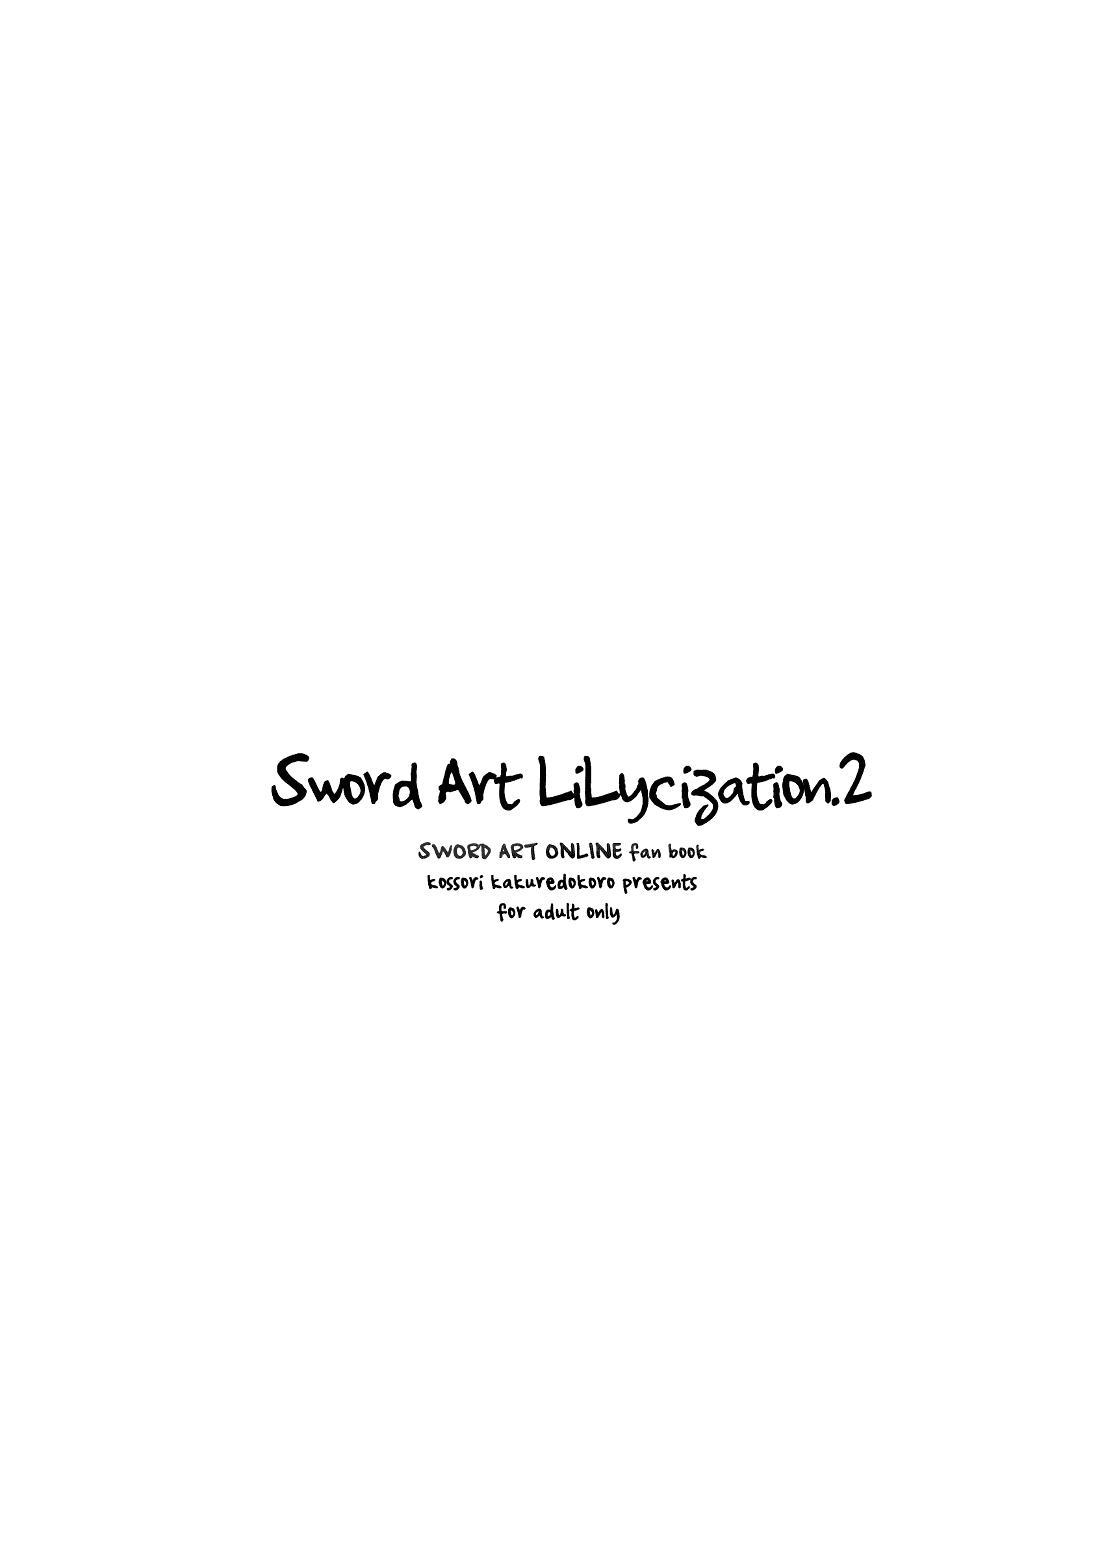 Sword Art Lilycization.2 19